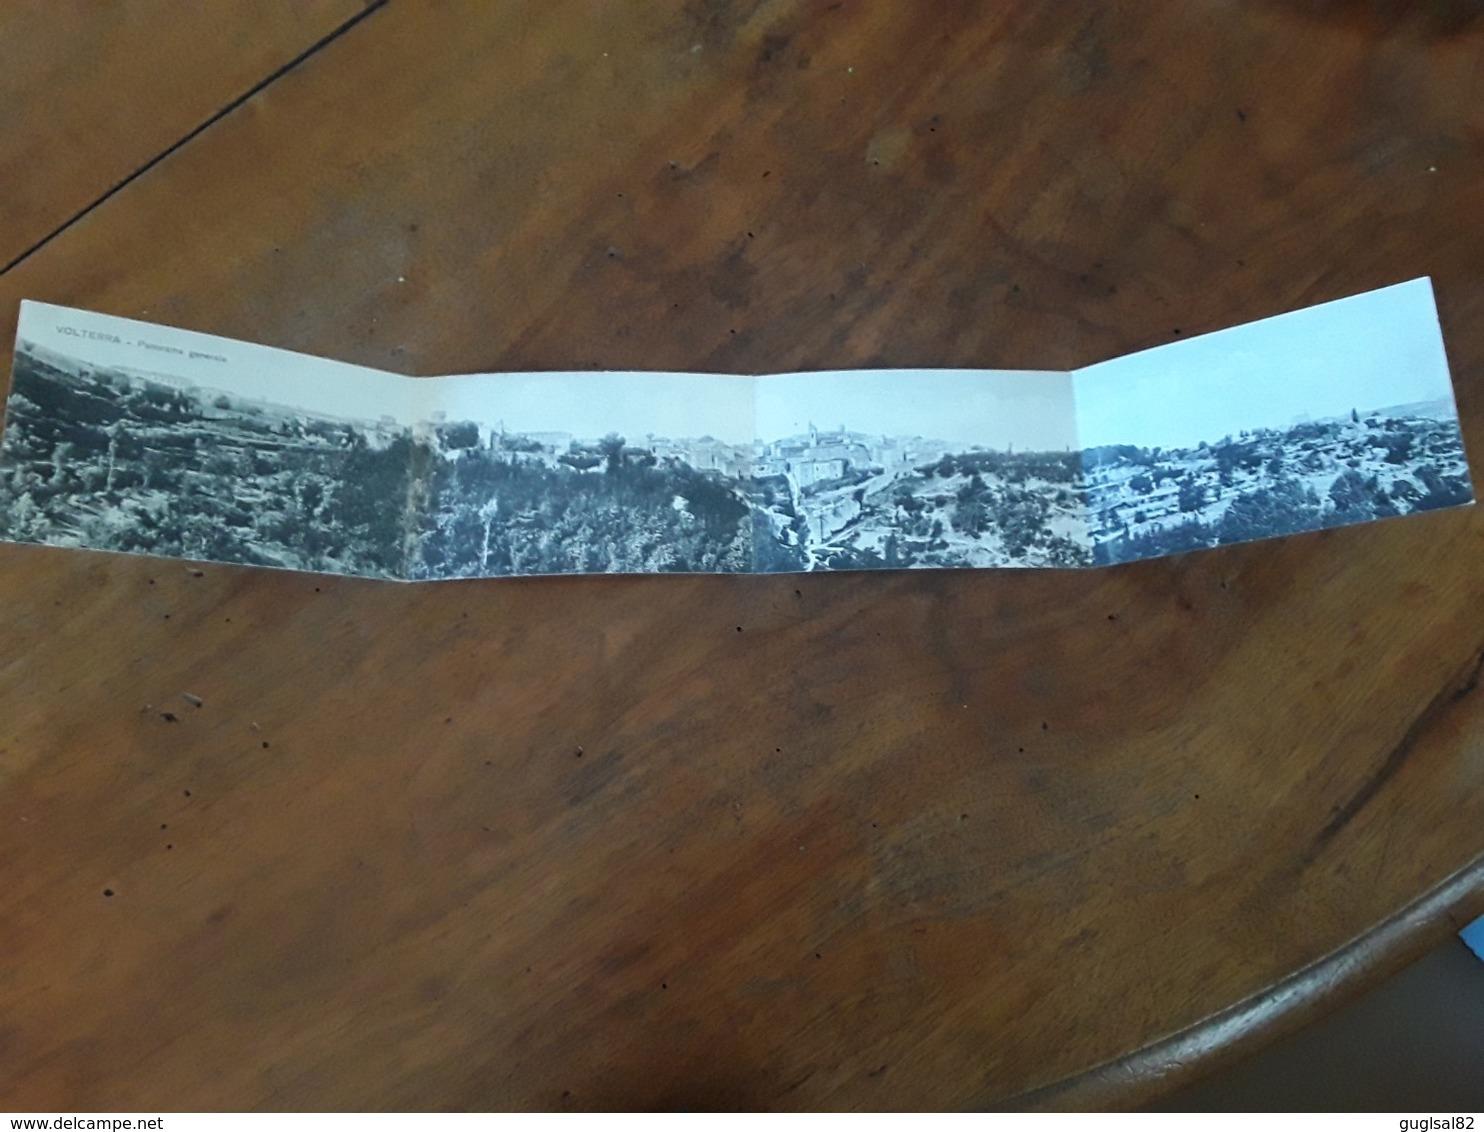 Cartolina Postale Panoramica 1925, Volterra Panorama Generale - Pisa